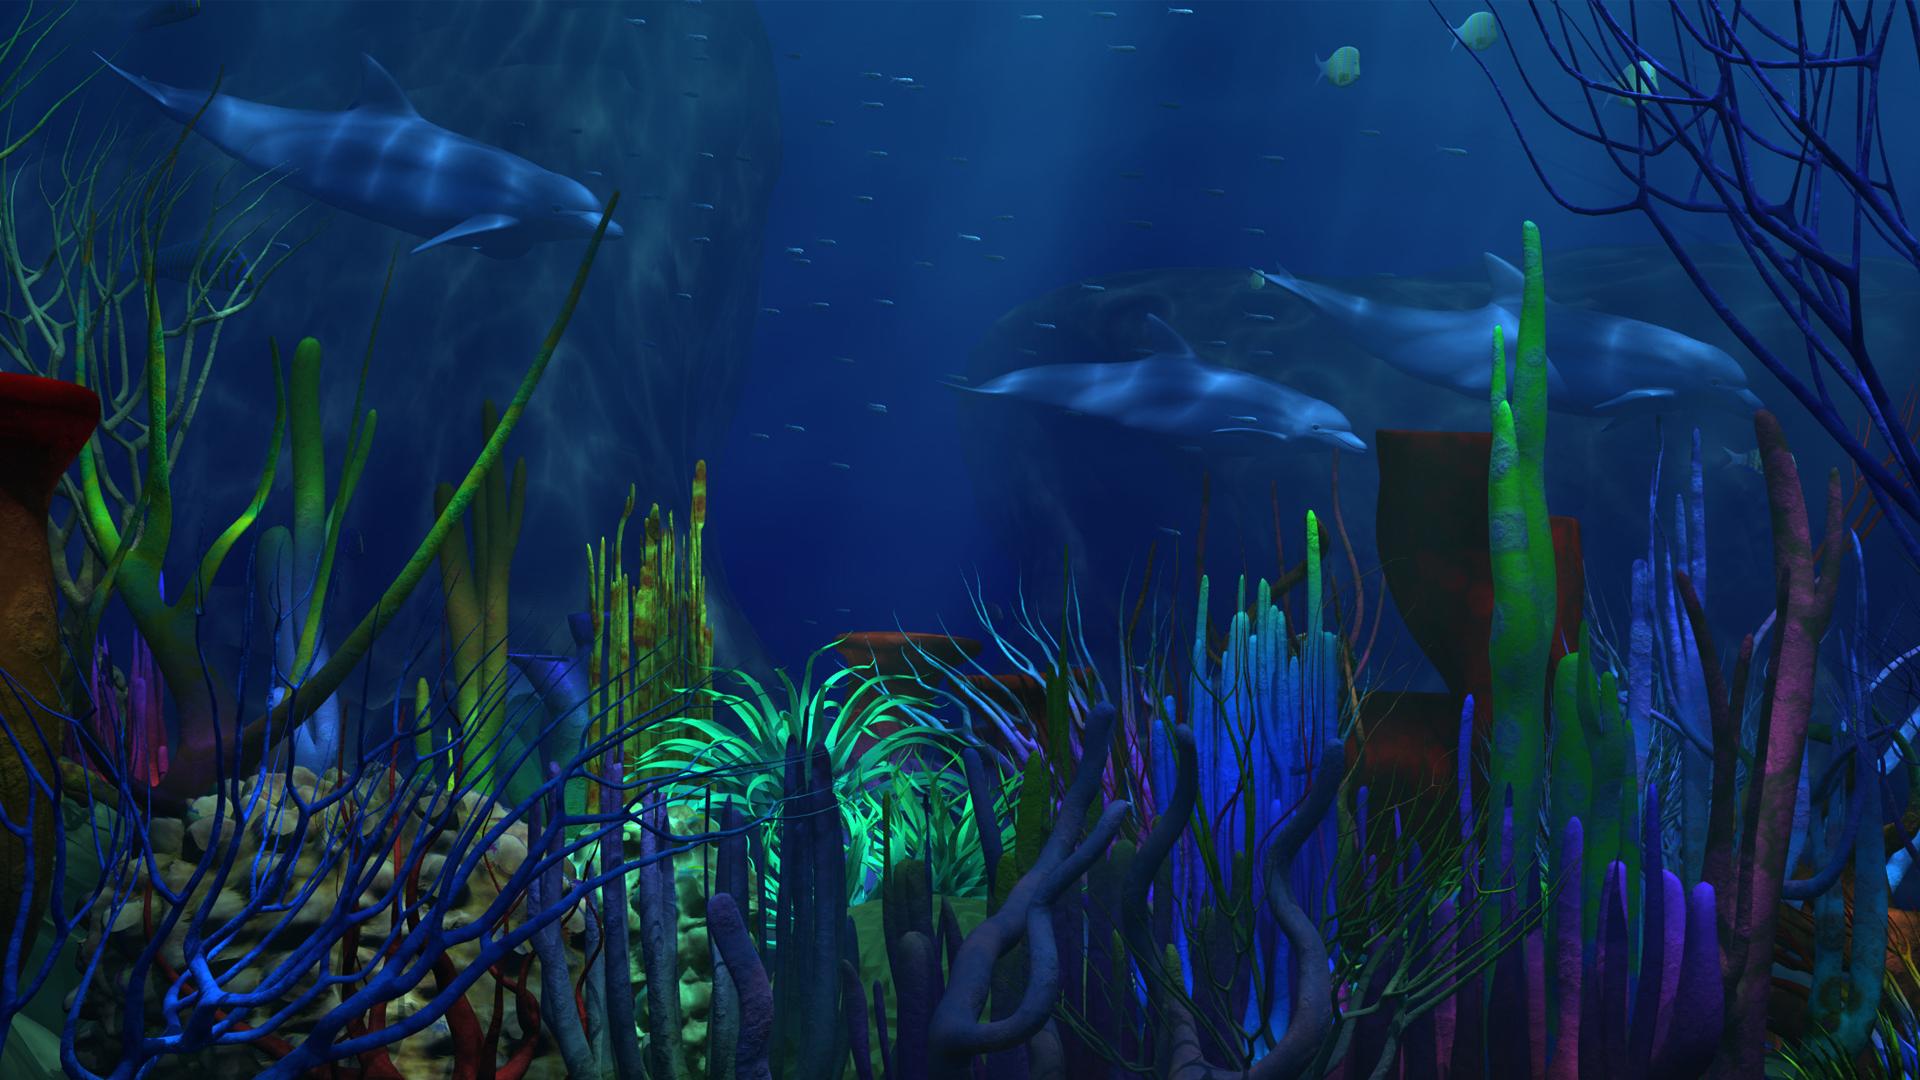 Hd wallpaper underwater - 1920x1080 1 Hebus Org High Definition Wallpapers